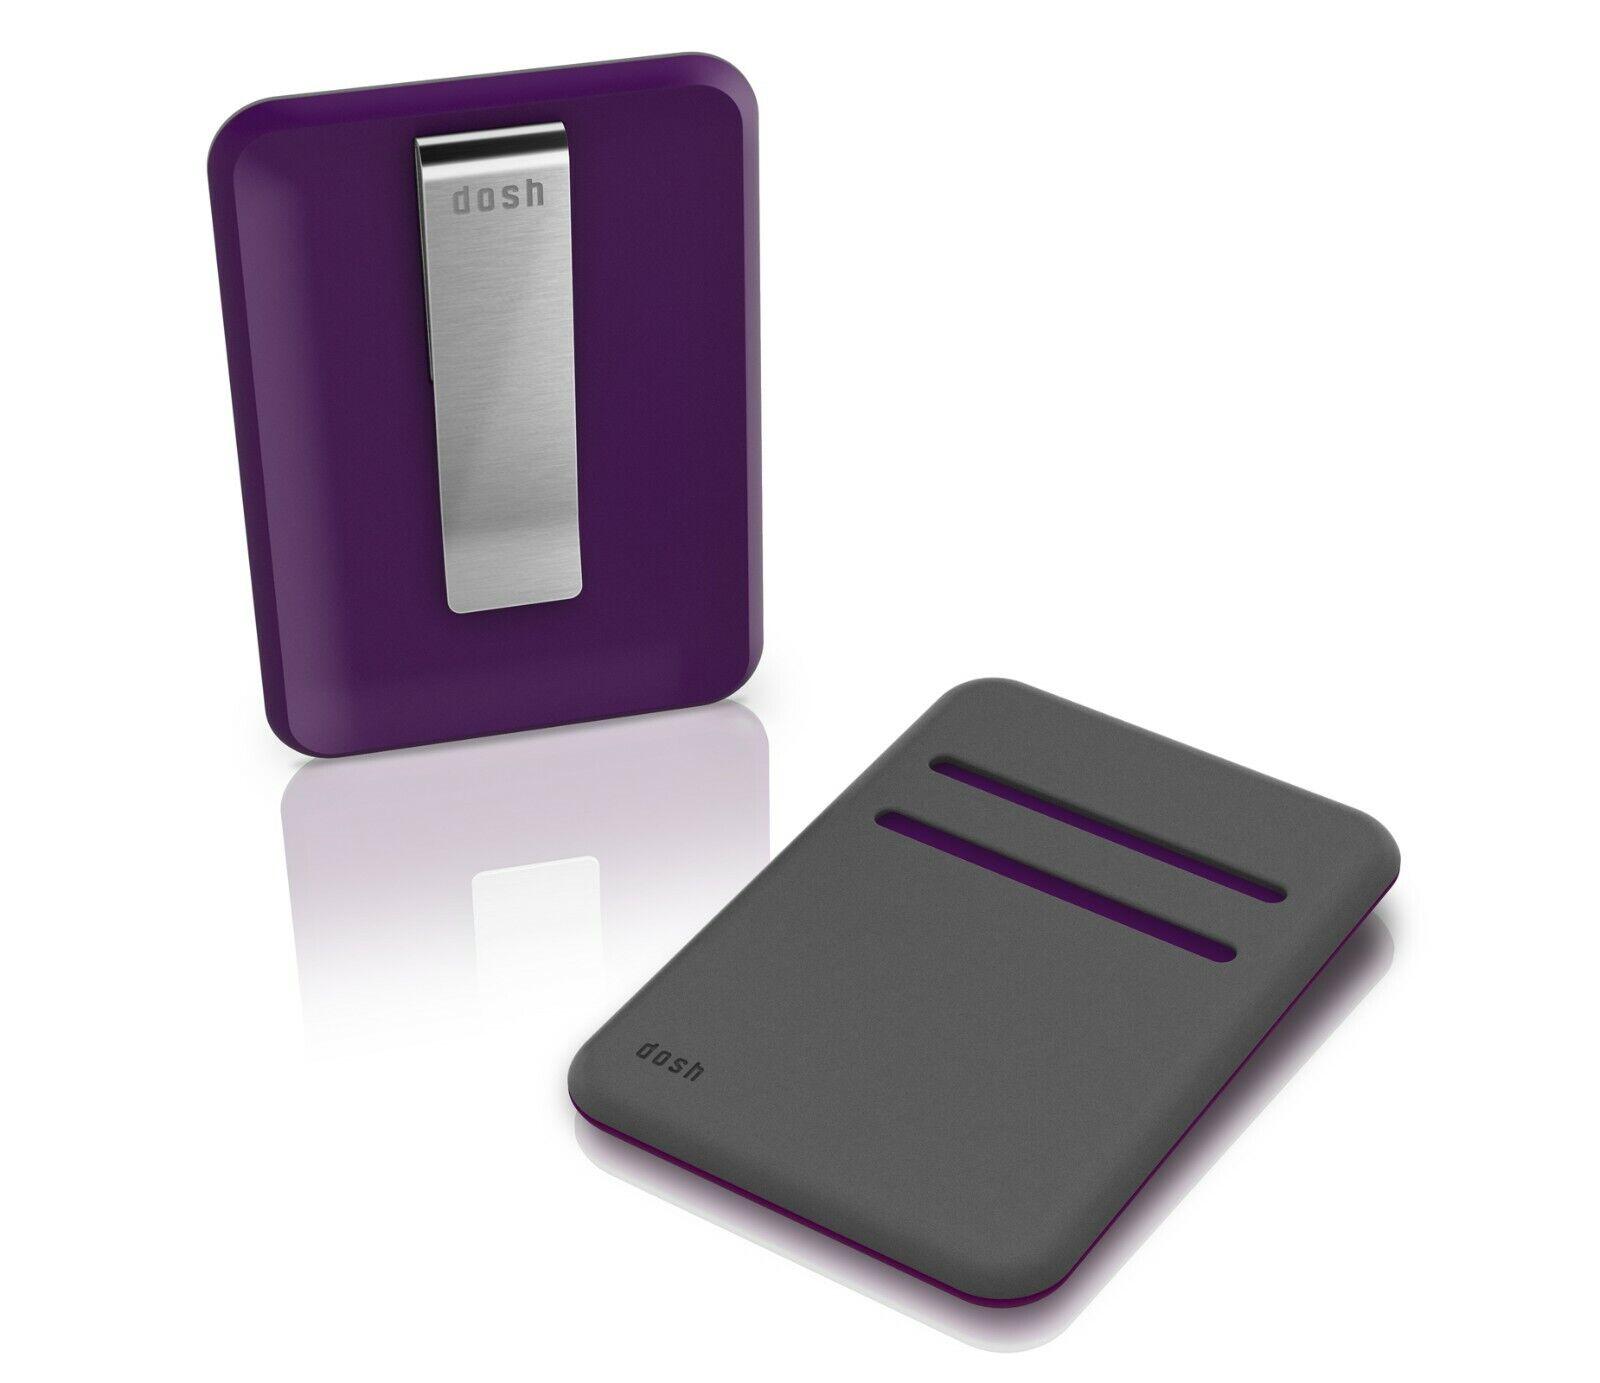 DOSH - Blade compact men's designer wallet - Phantom